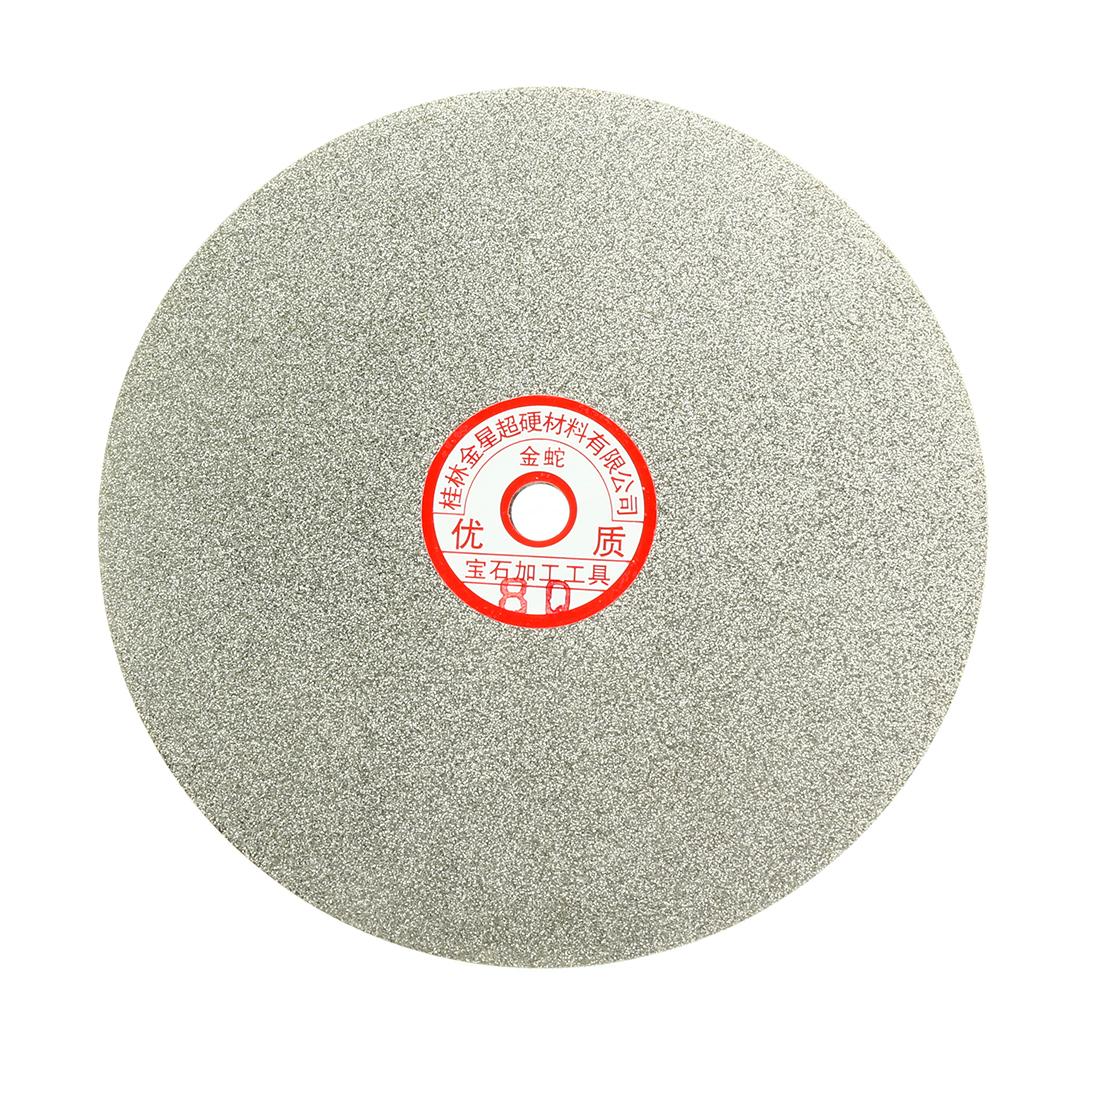 200mm 8-inch Grit 80 Diamond Coated Flat Lap Disk Wheel Grinding Sanding Disc